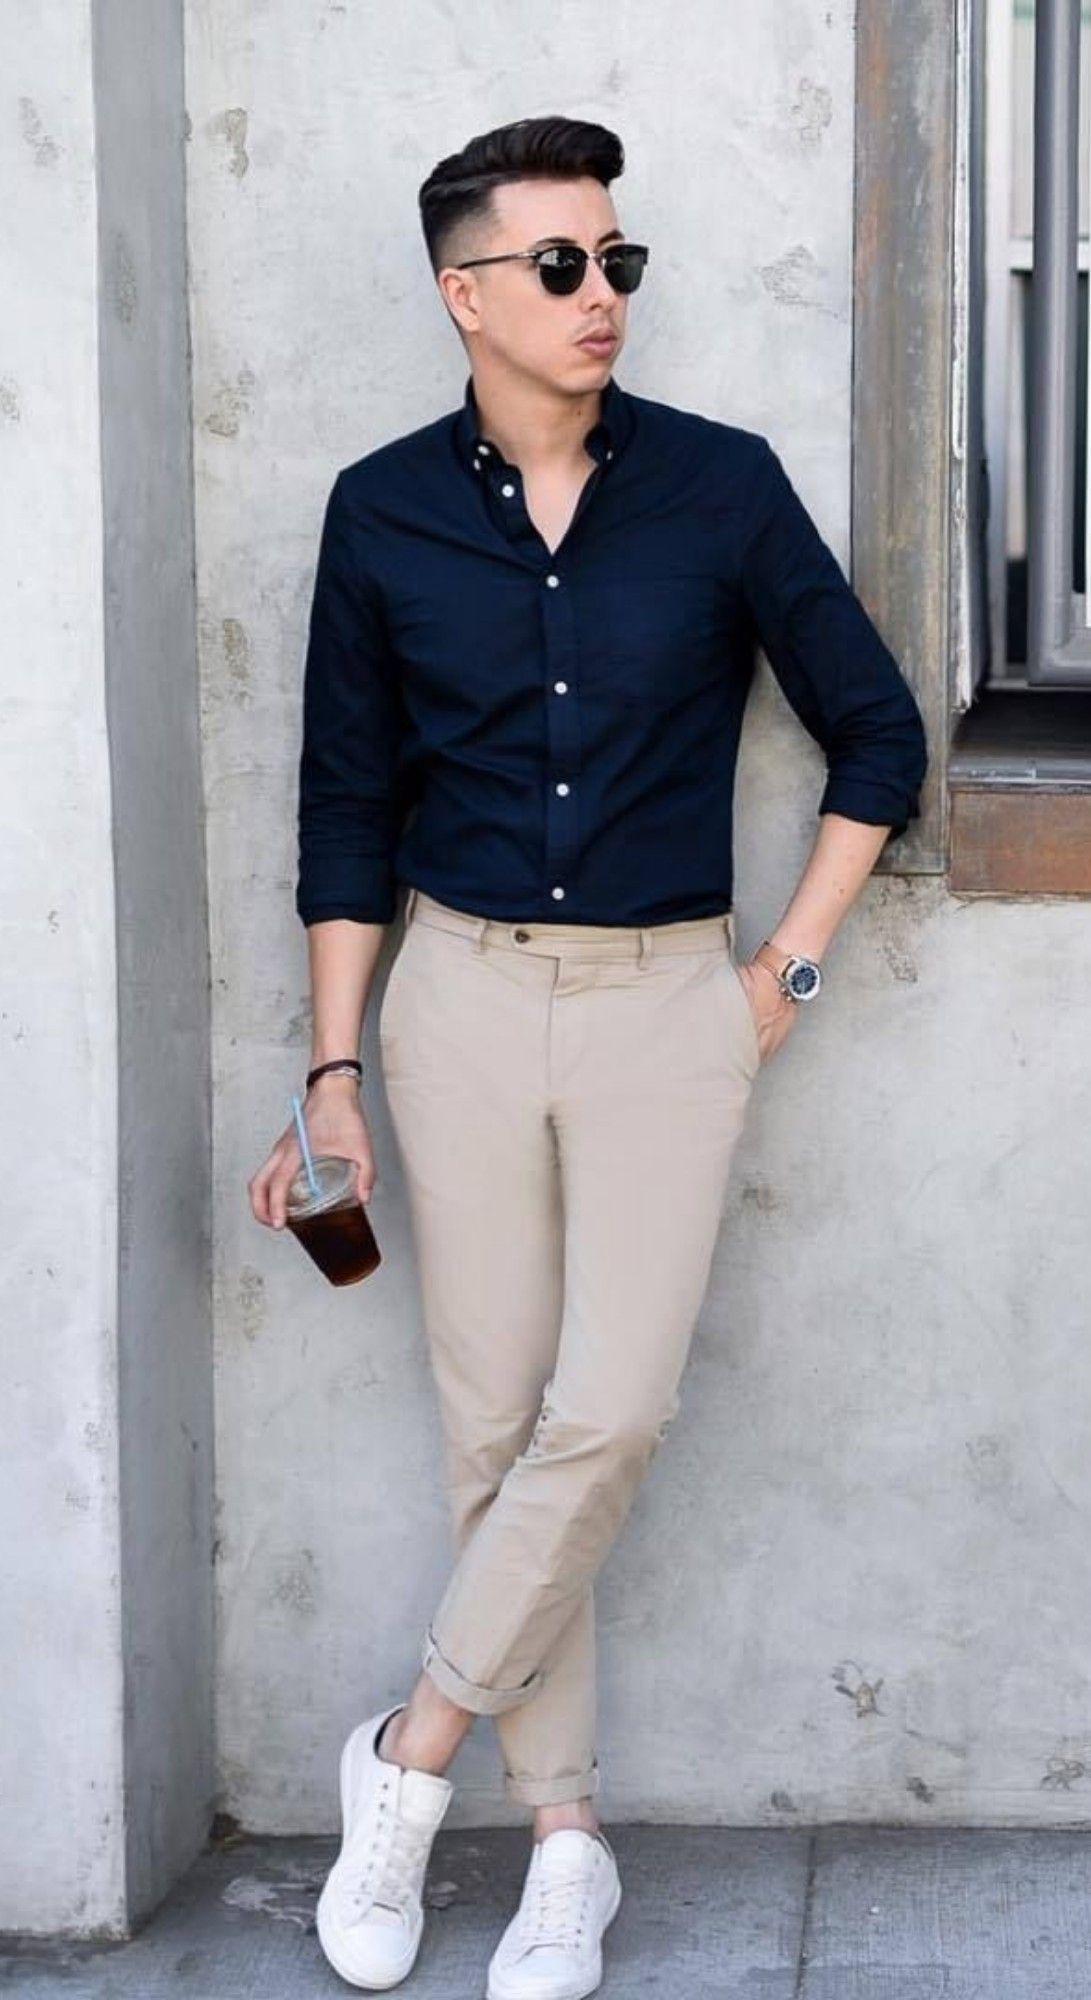 Sneakers Men Men Fashion Casual Shirts Mens Casual Outfits Summer Mens Fashion Casual Outfits [ 2000 x 1091 Pixel ]